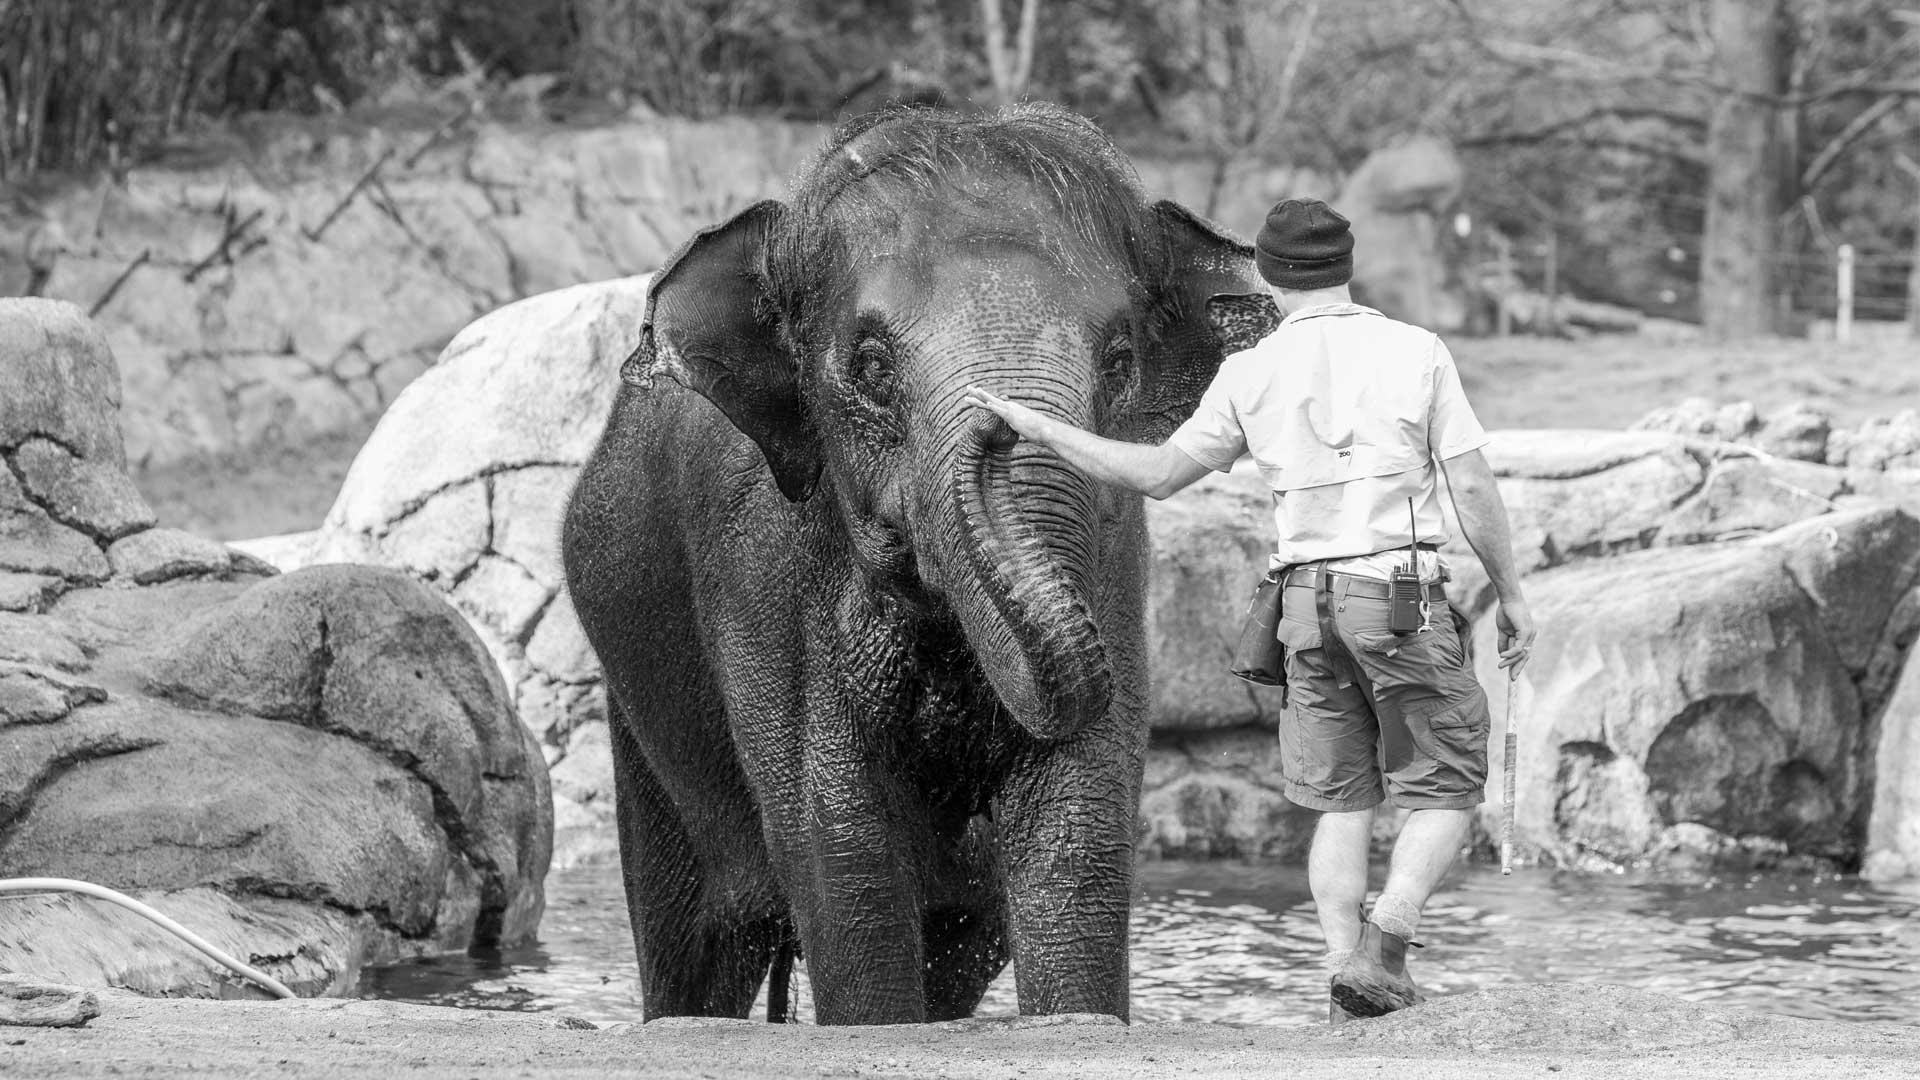 https://rfacdn.nz/zoo/assets/media/world-elephant-day-gallery-2.jpg